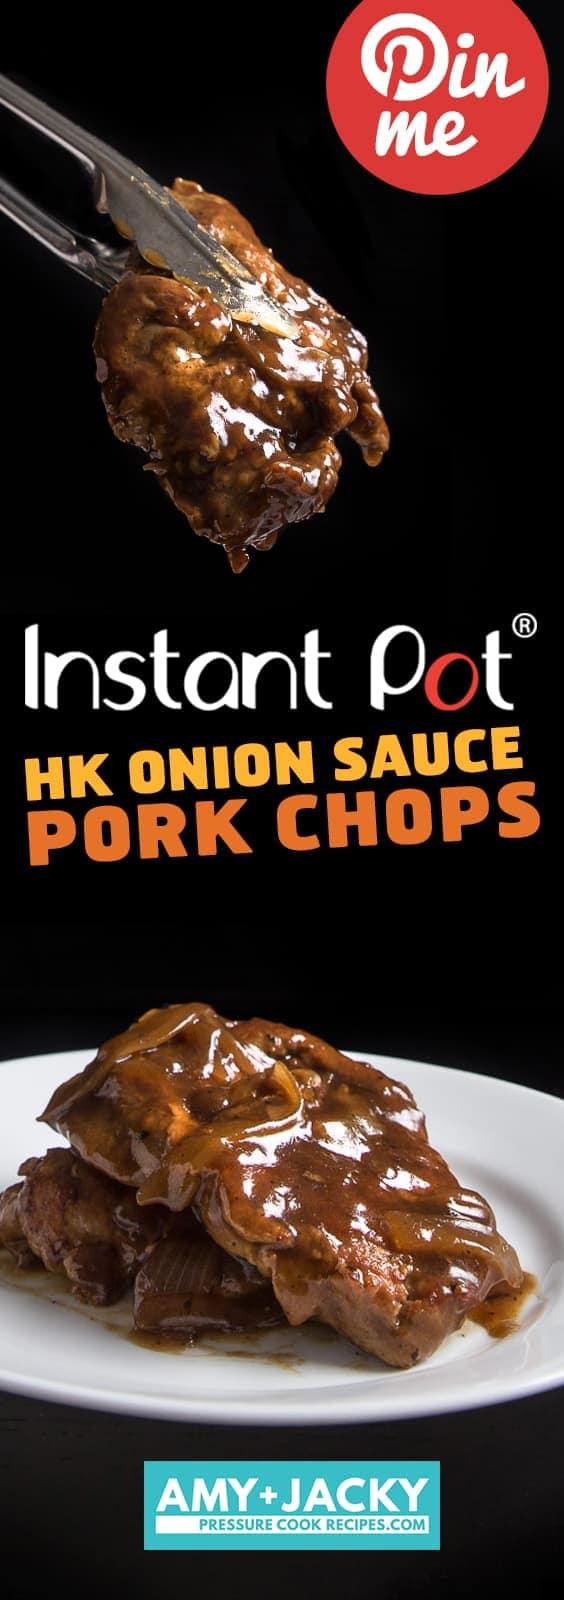 https://www.pressurecookrecipes.com/wp-content/uploads/2016/08/instant-pot-pork-chops-onion-p.jpg